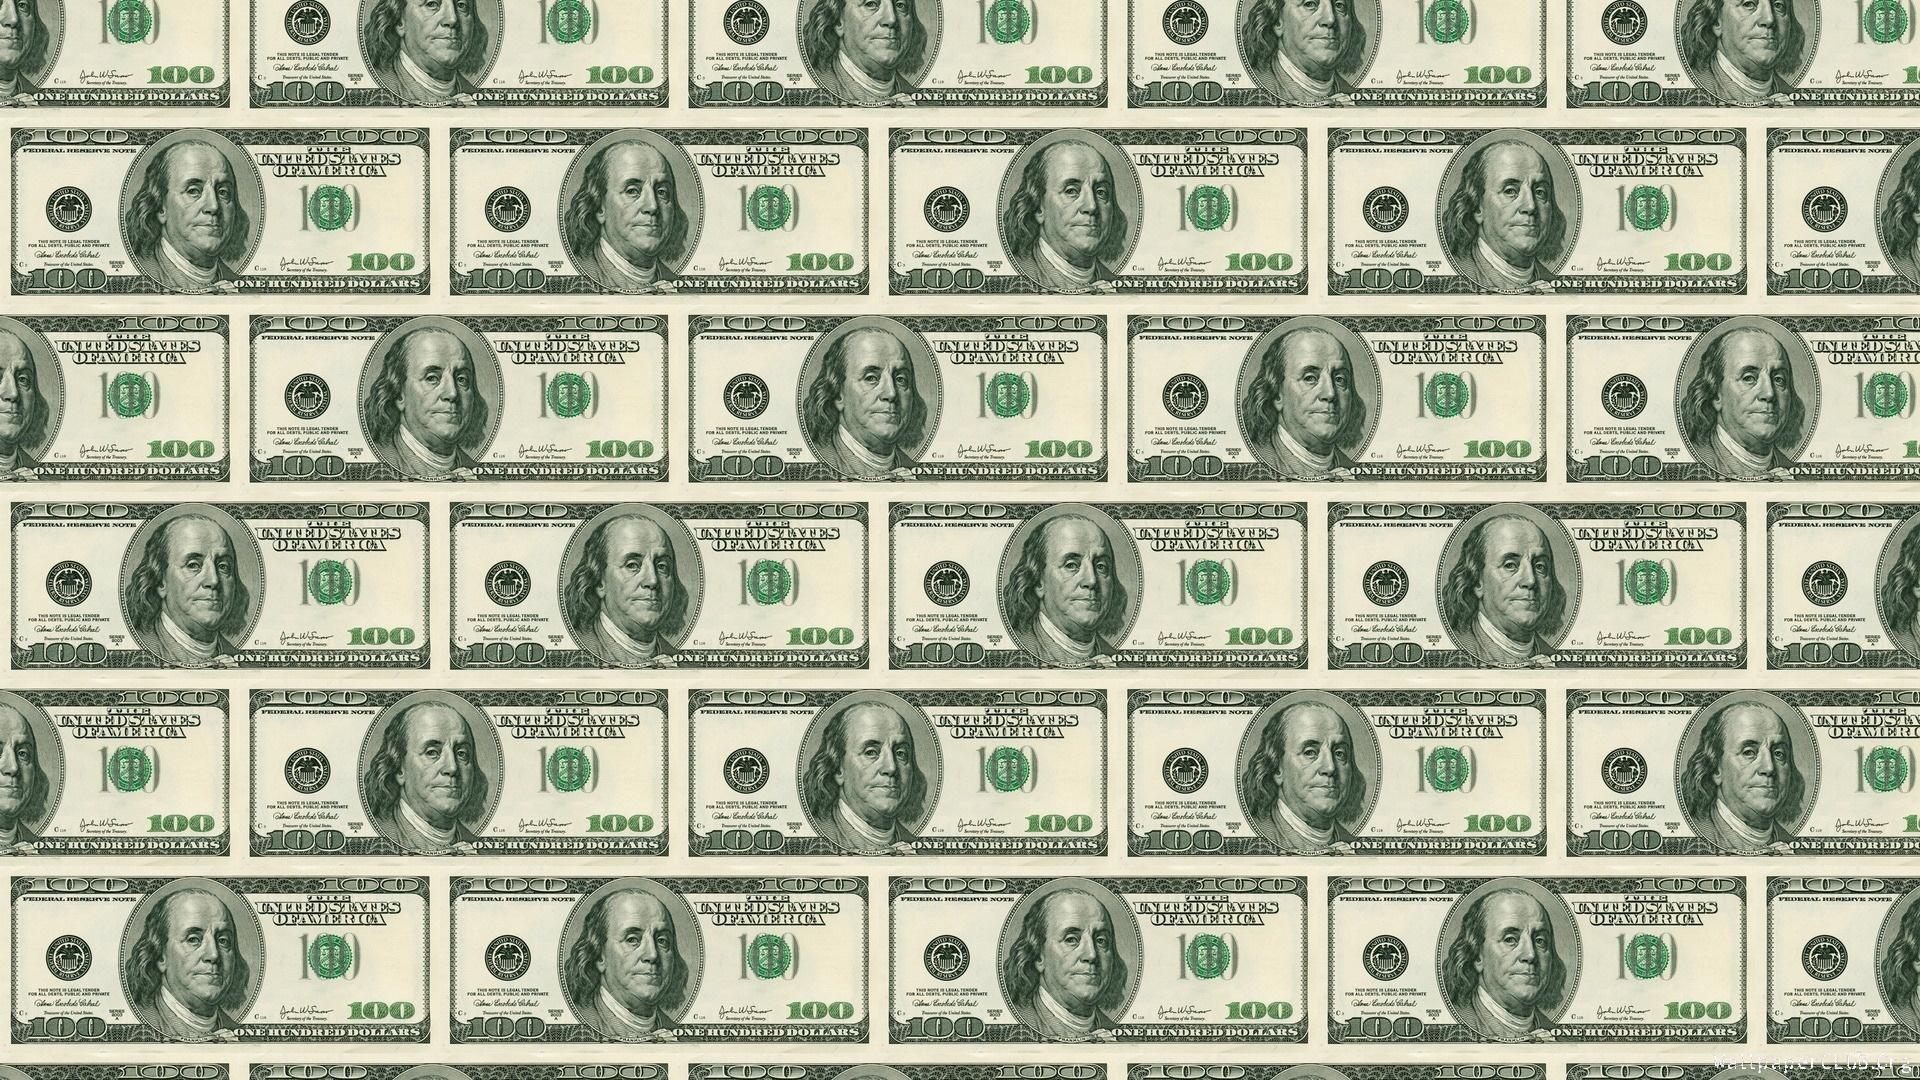 Dollar Hd Wallpaper Background Image 1920x1080 Id